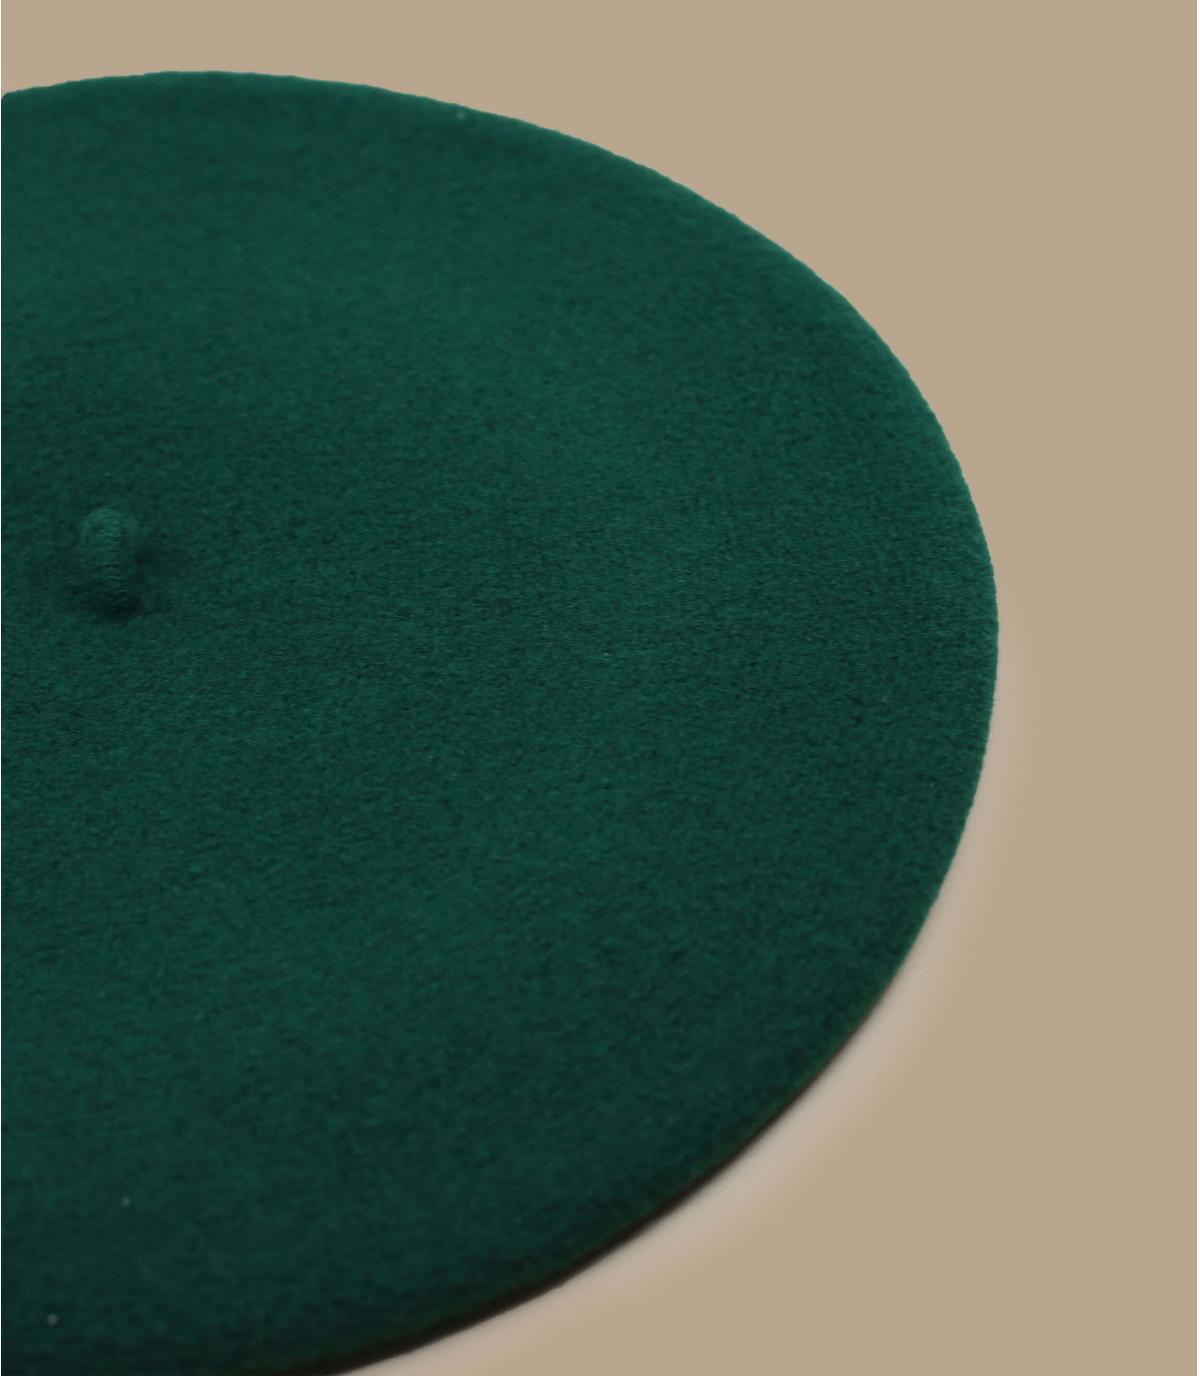 Baskenmütze grün Laulhère